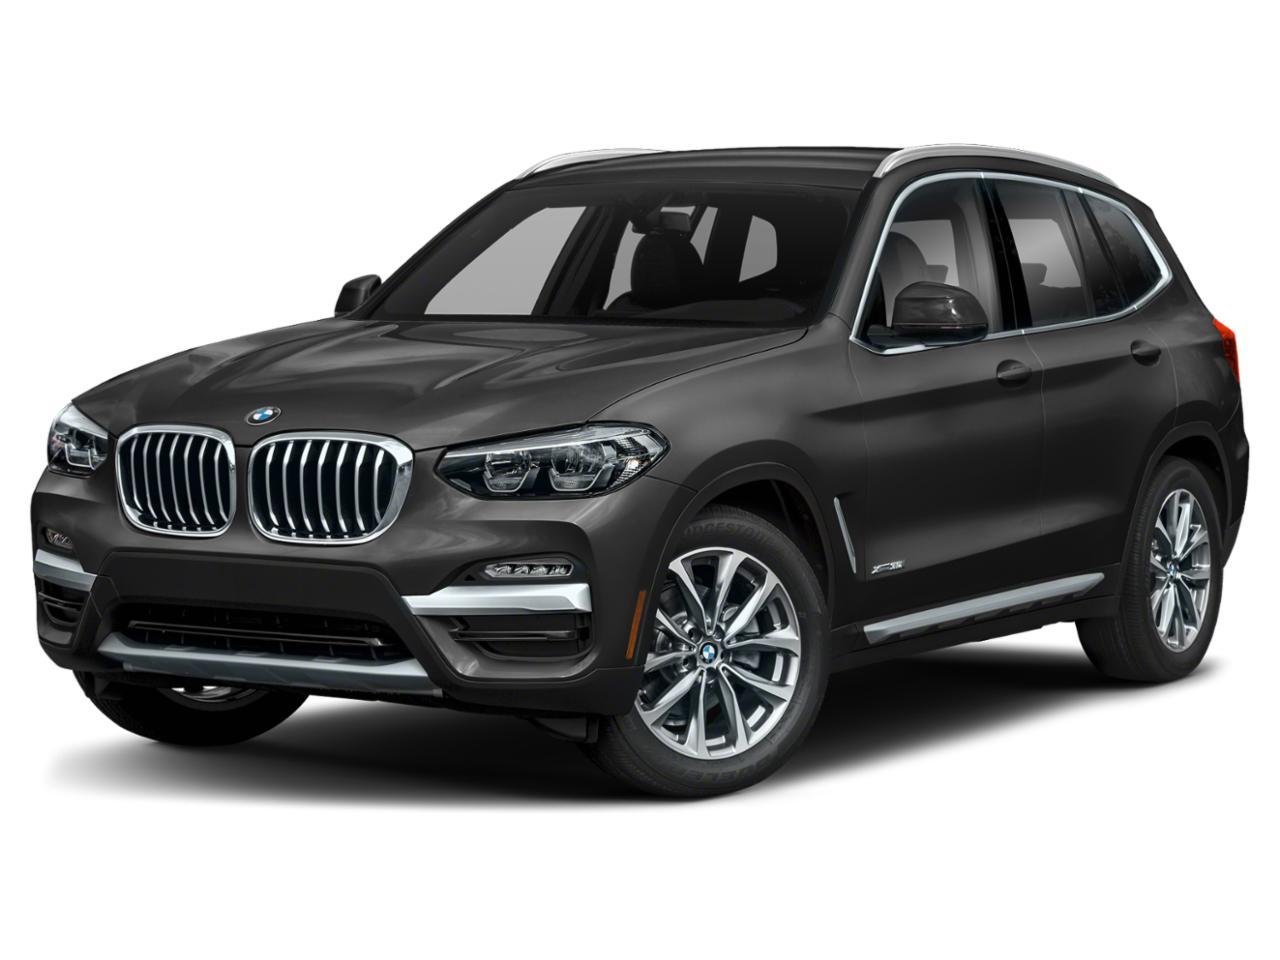 2021 BMW X3 M40i Vehicle Photo in Grapevine, TX 76051